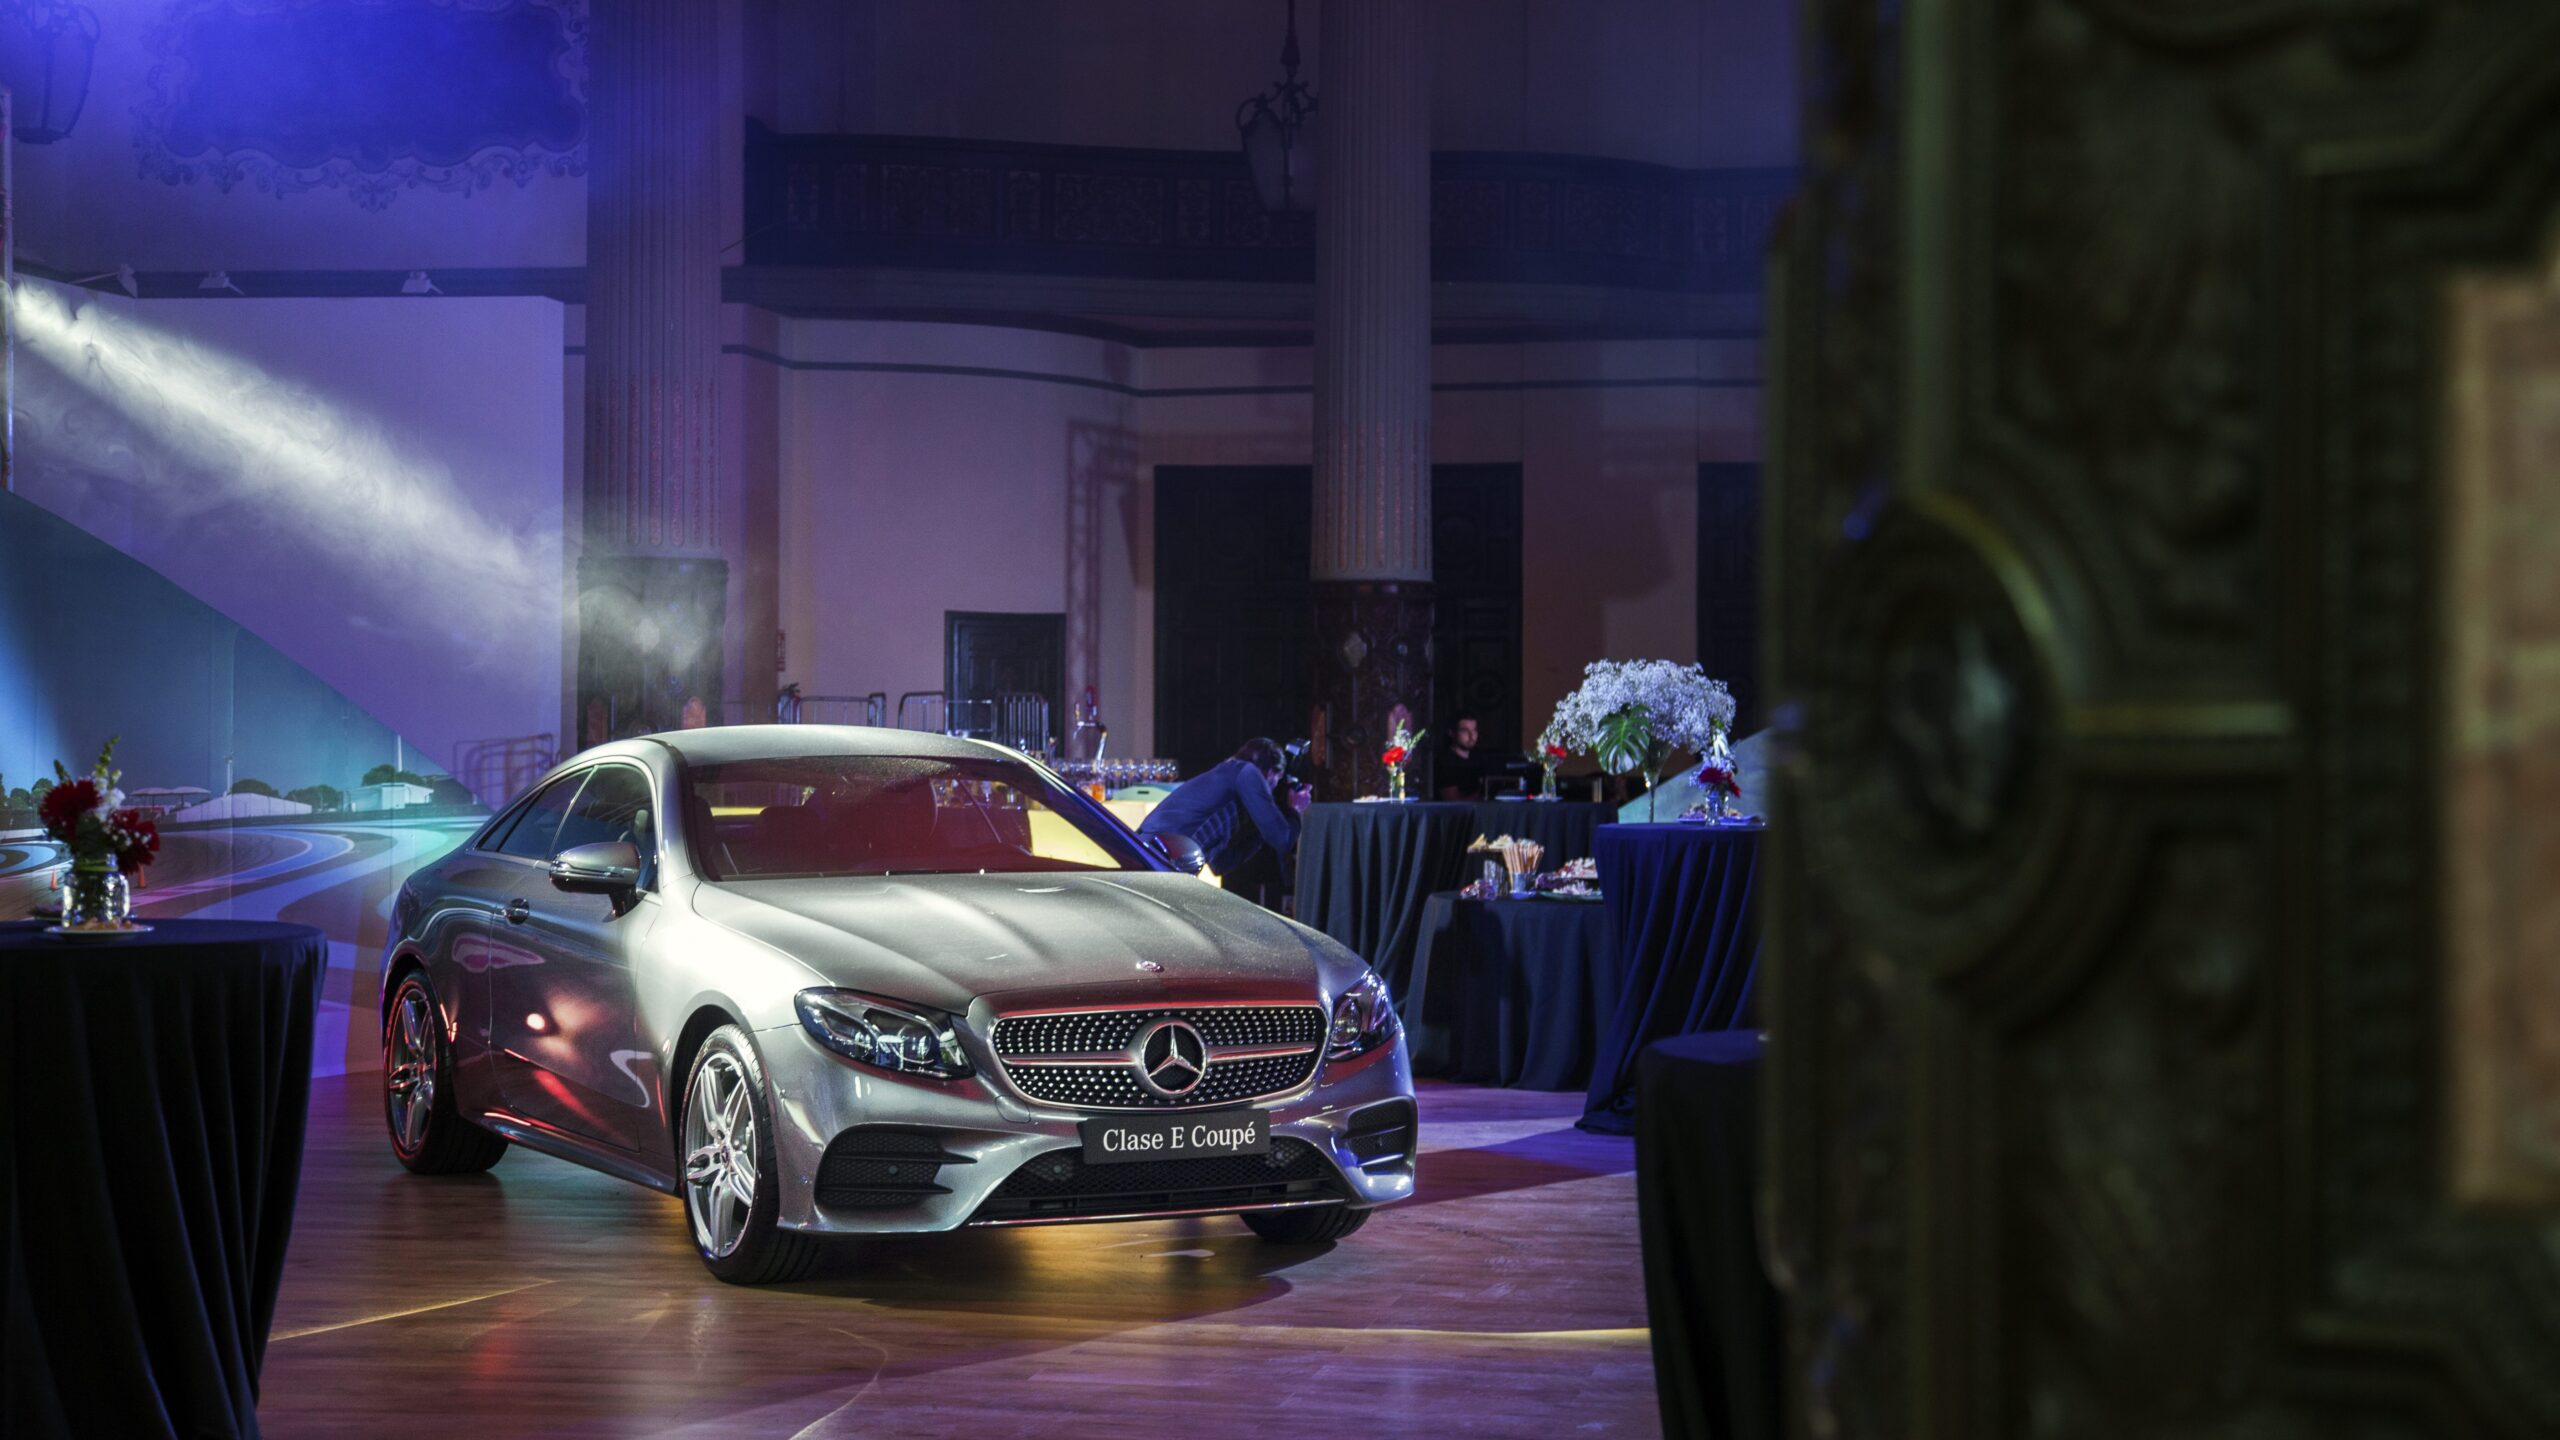 Se presentan en Sevilla los nuevos Mercedes-Benz Clase E Coupé, All-Terrain y Estate.